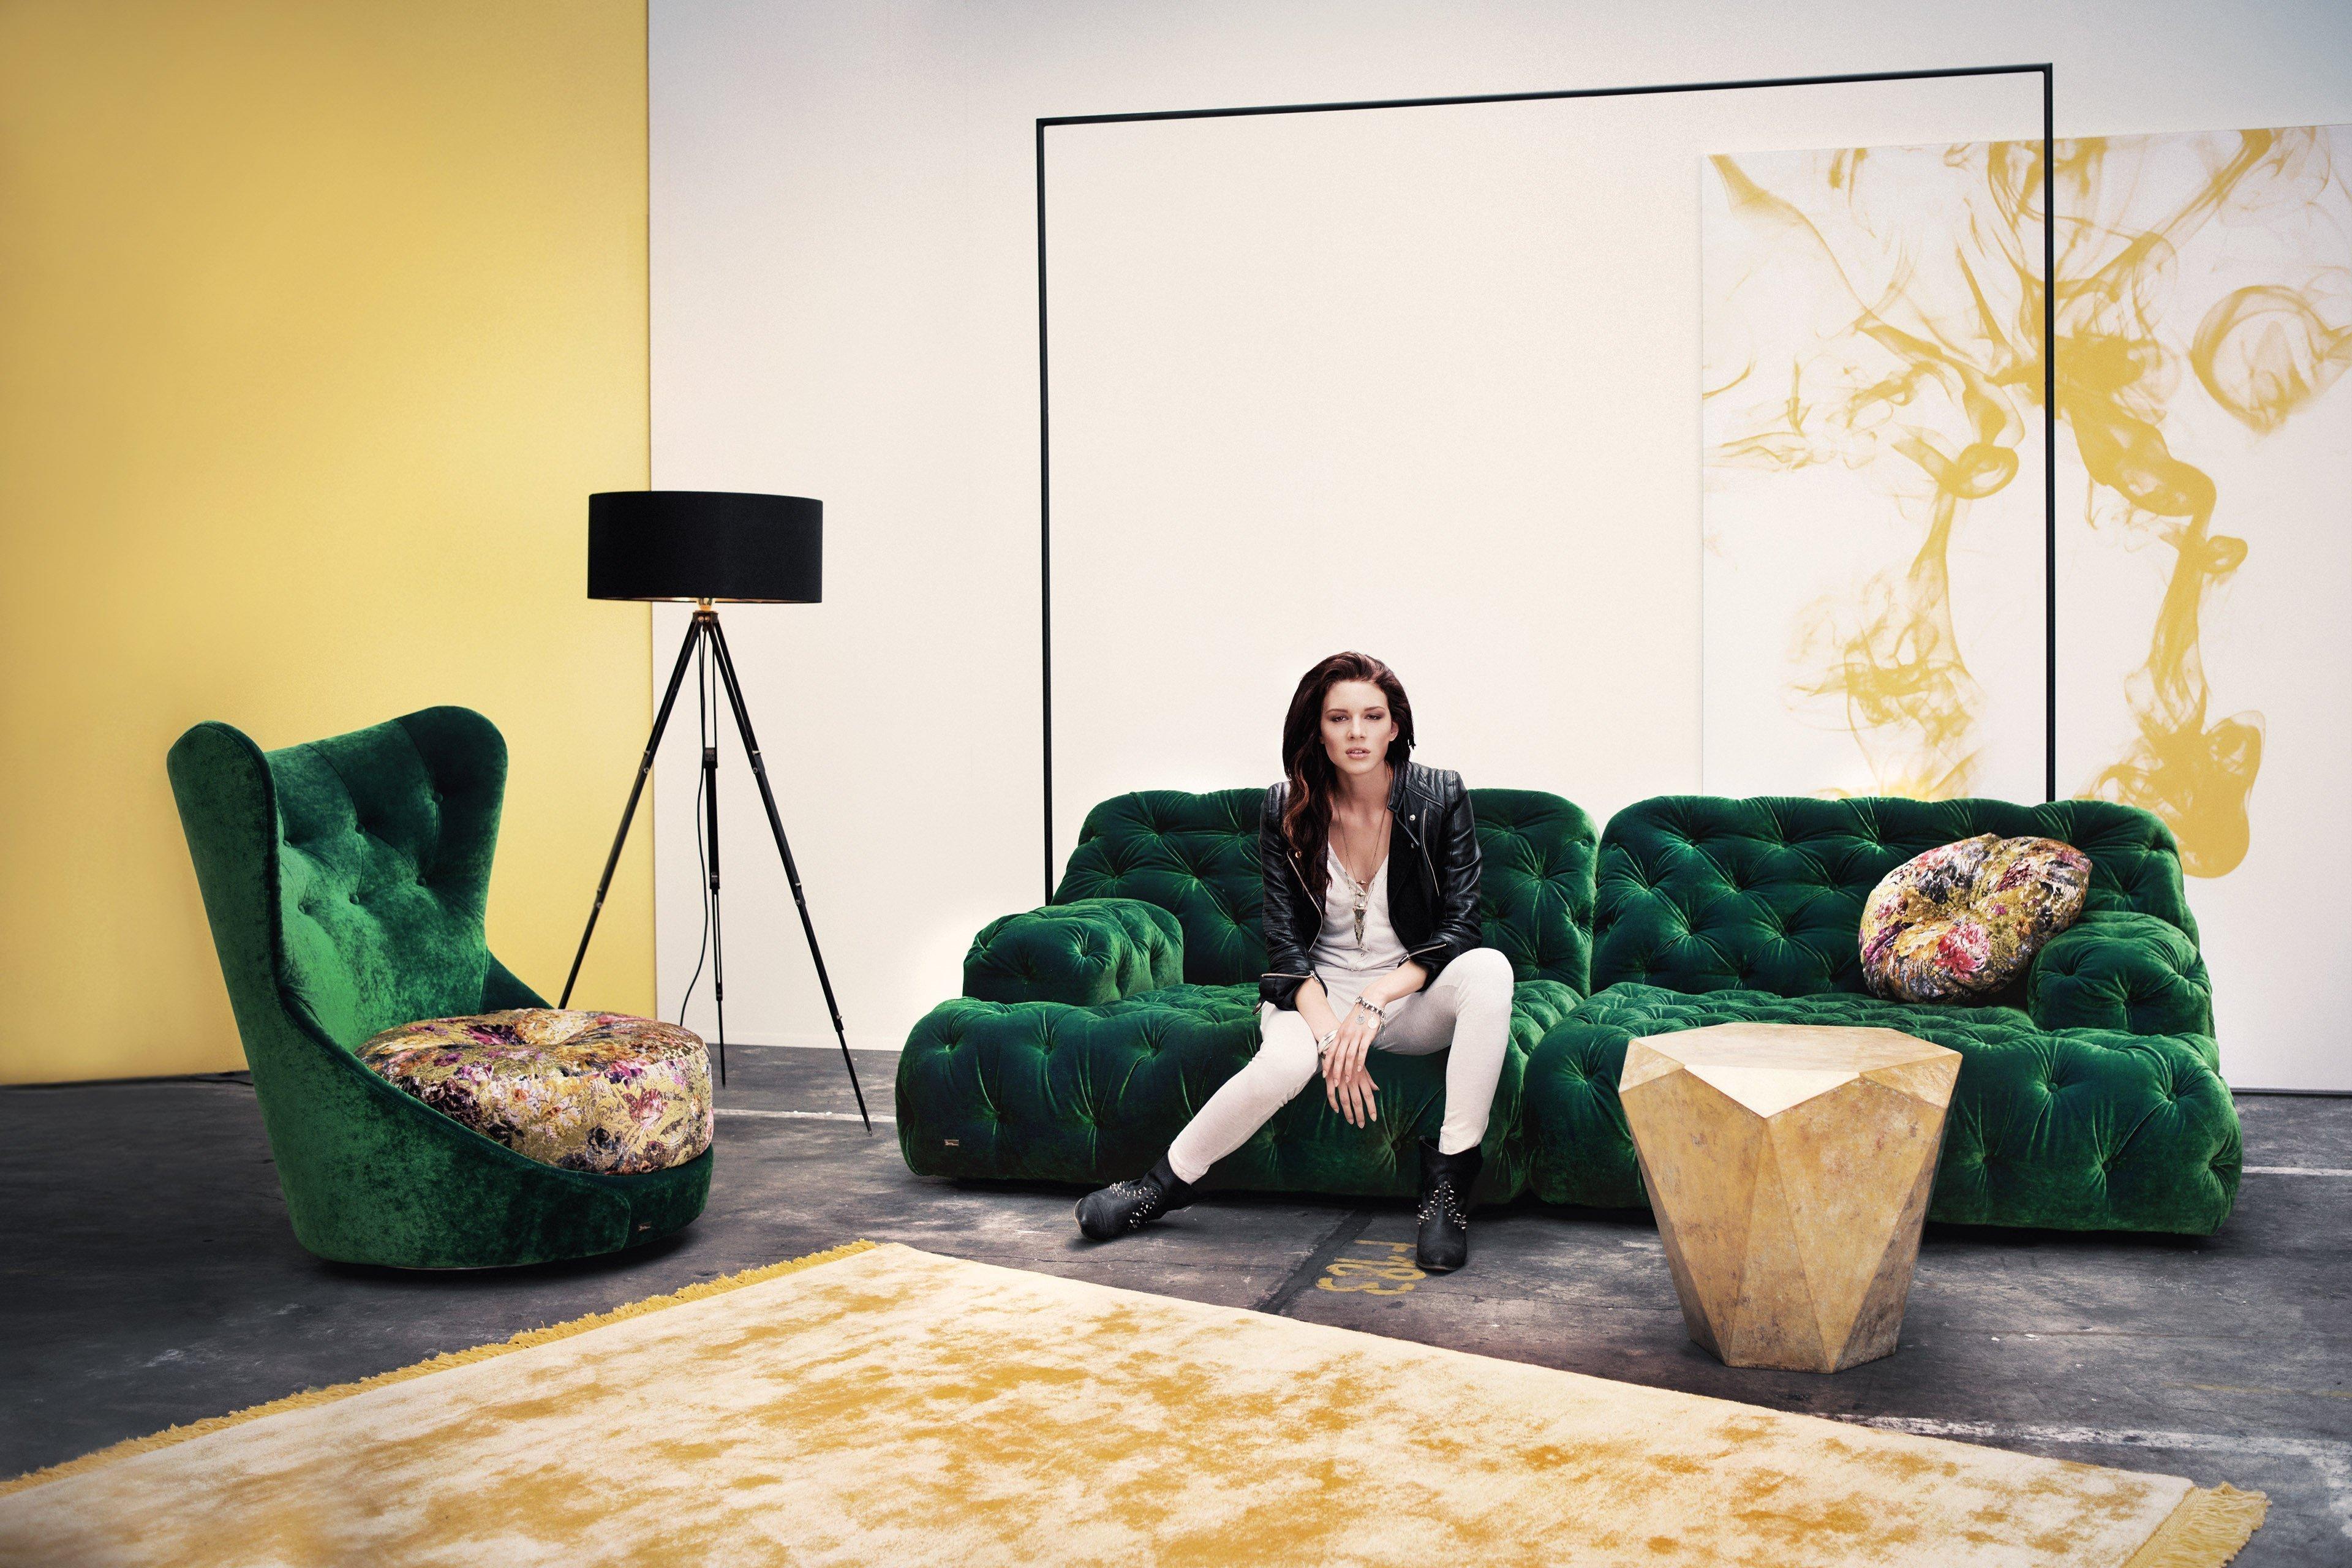 bretz cocoa island sofa in gr n m bel letz ihr online shop. Black Bedroom Furniture Sets. Home Design Ideas